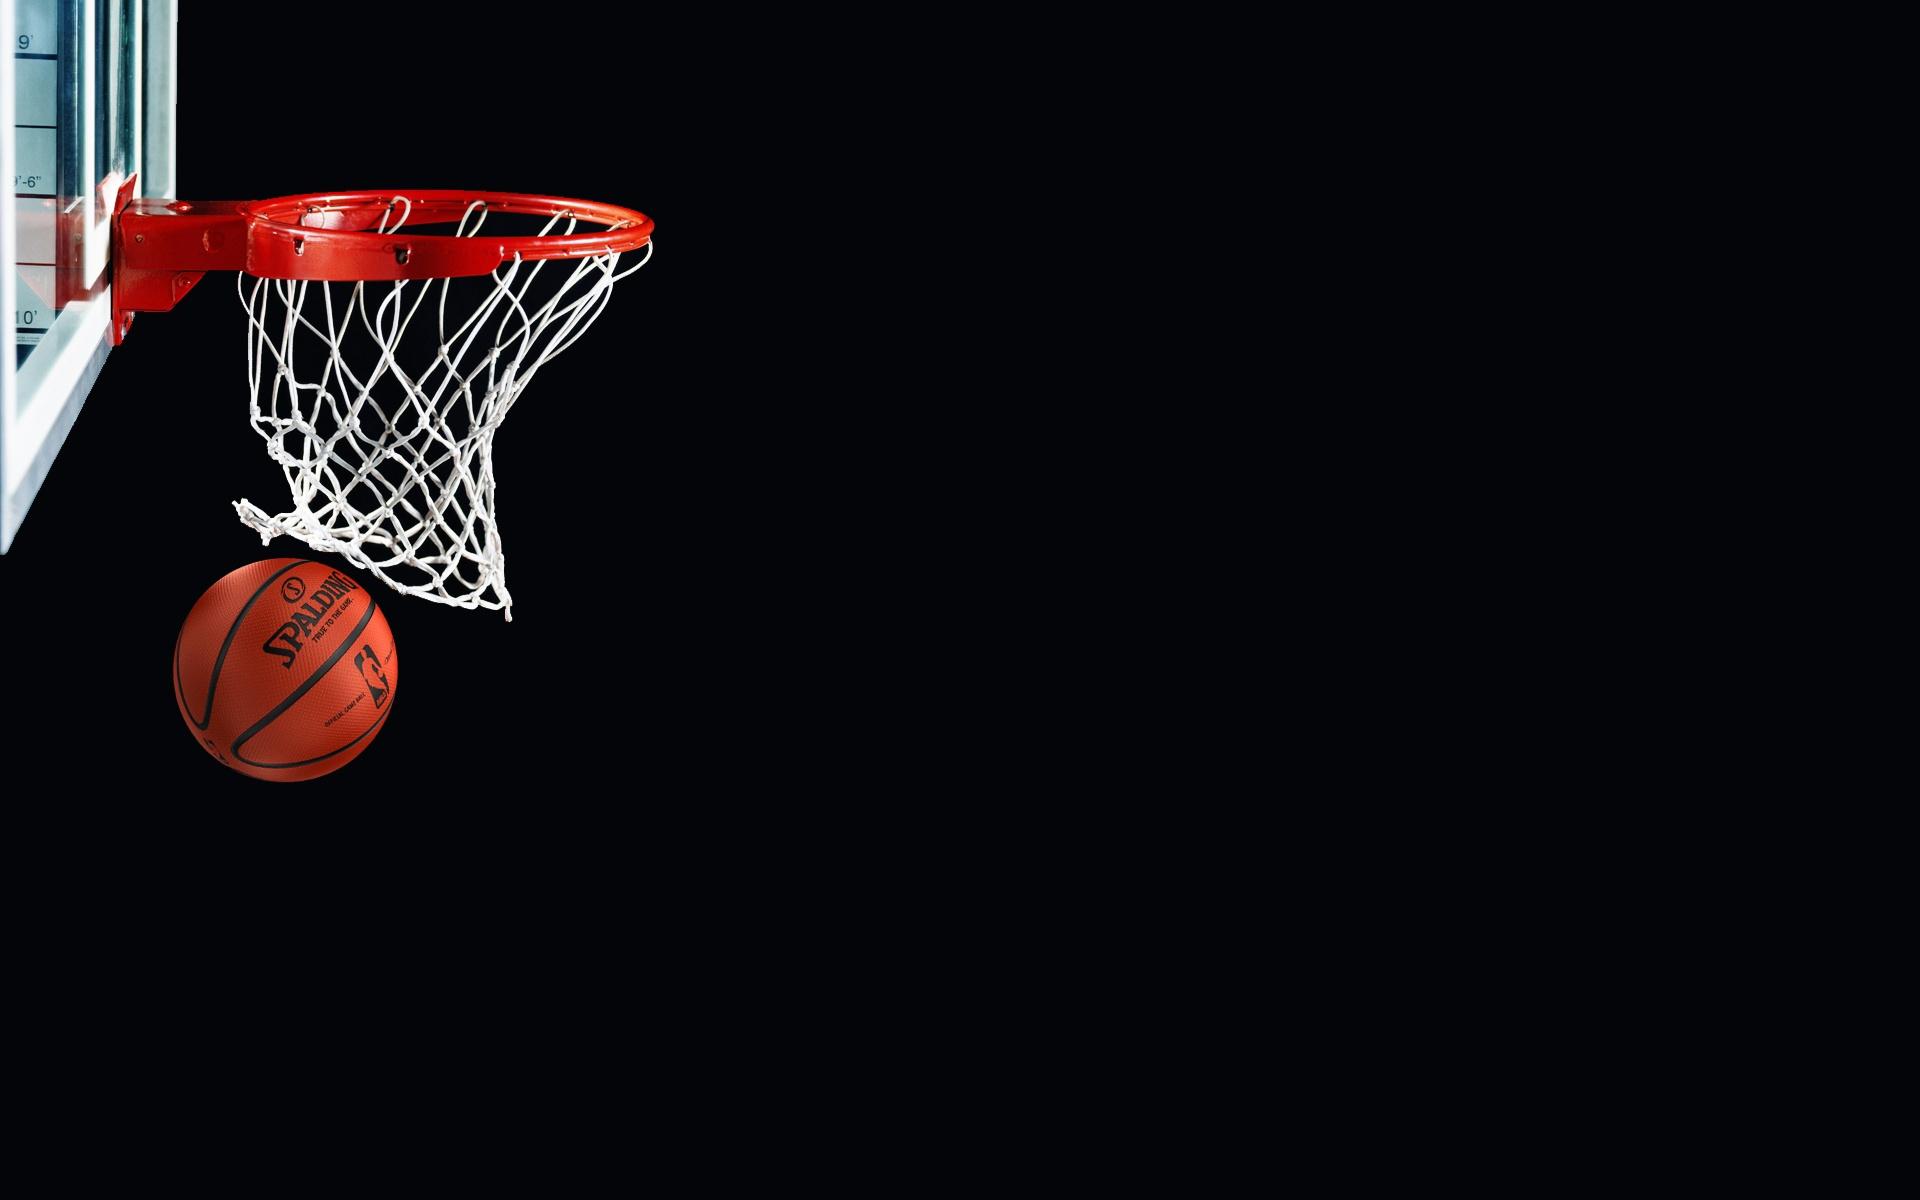 Awesome Basketball Backgrounds